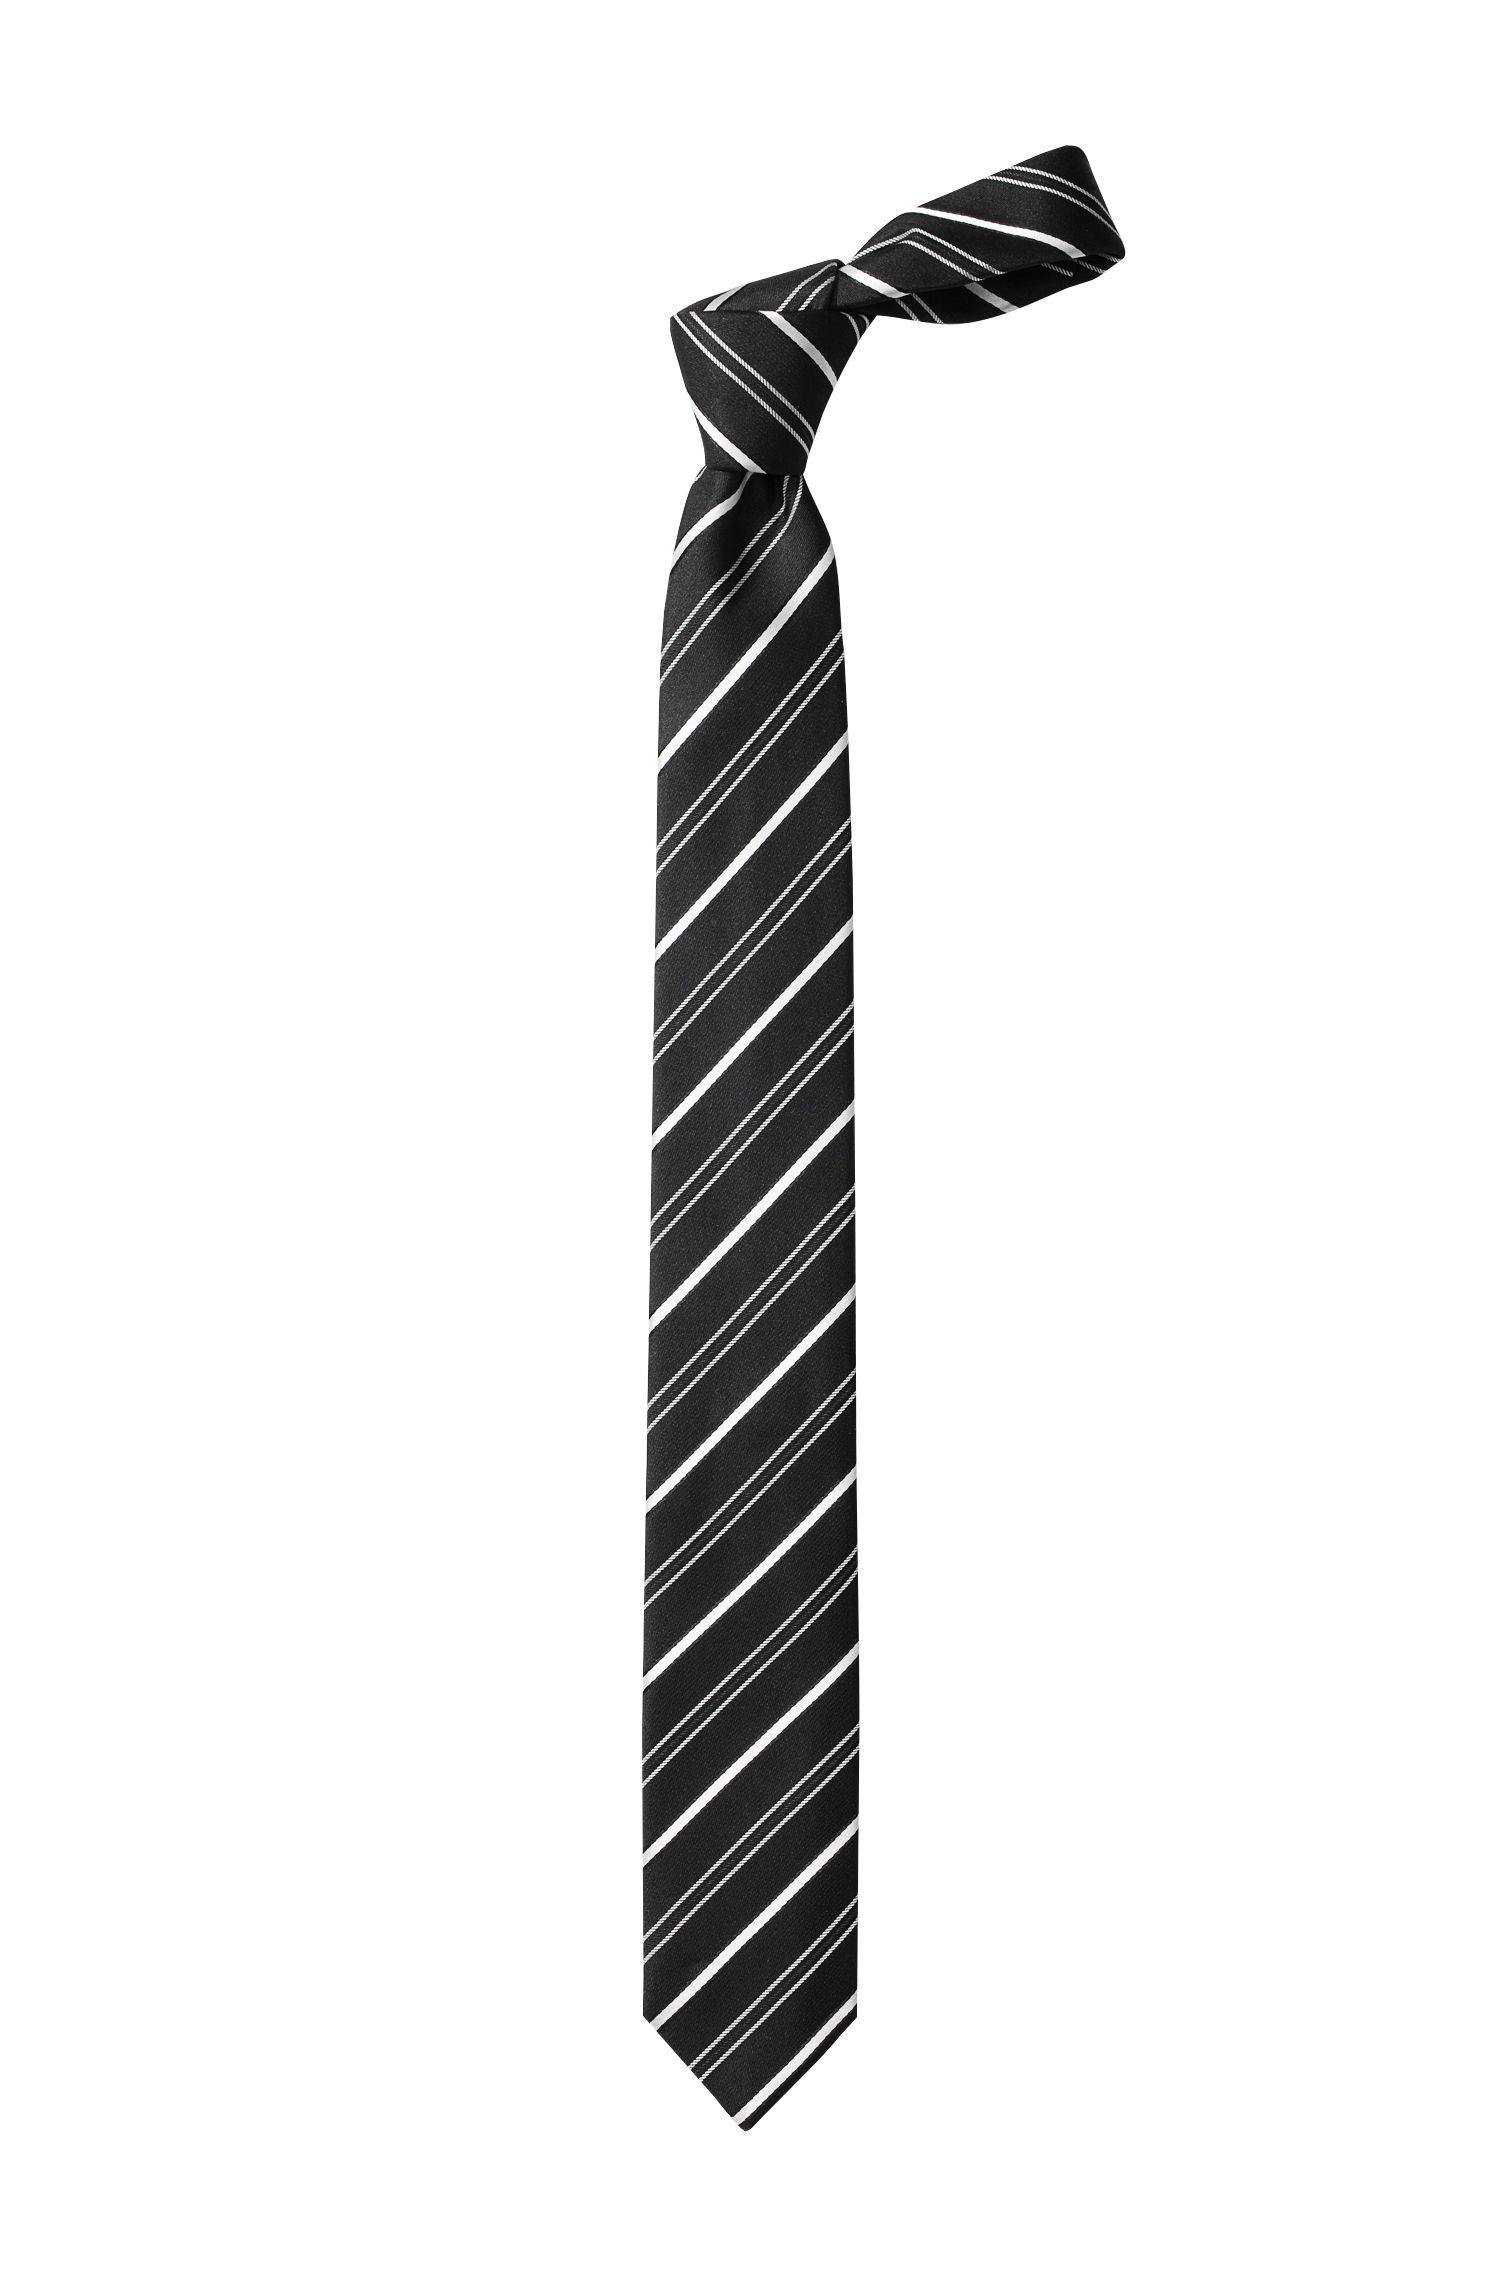 Cravate en soie, Tie 6cm